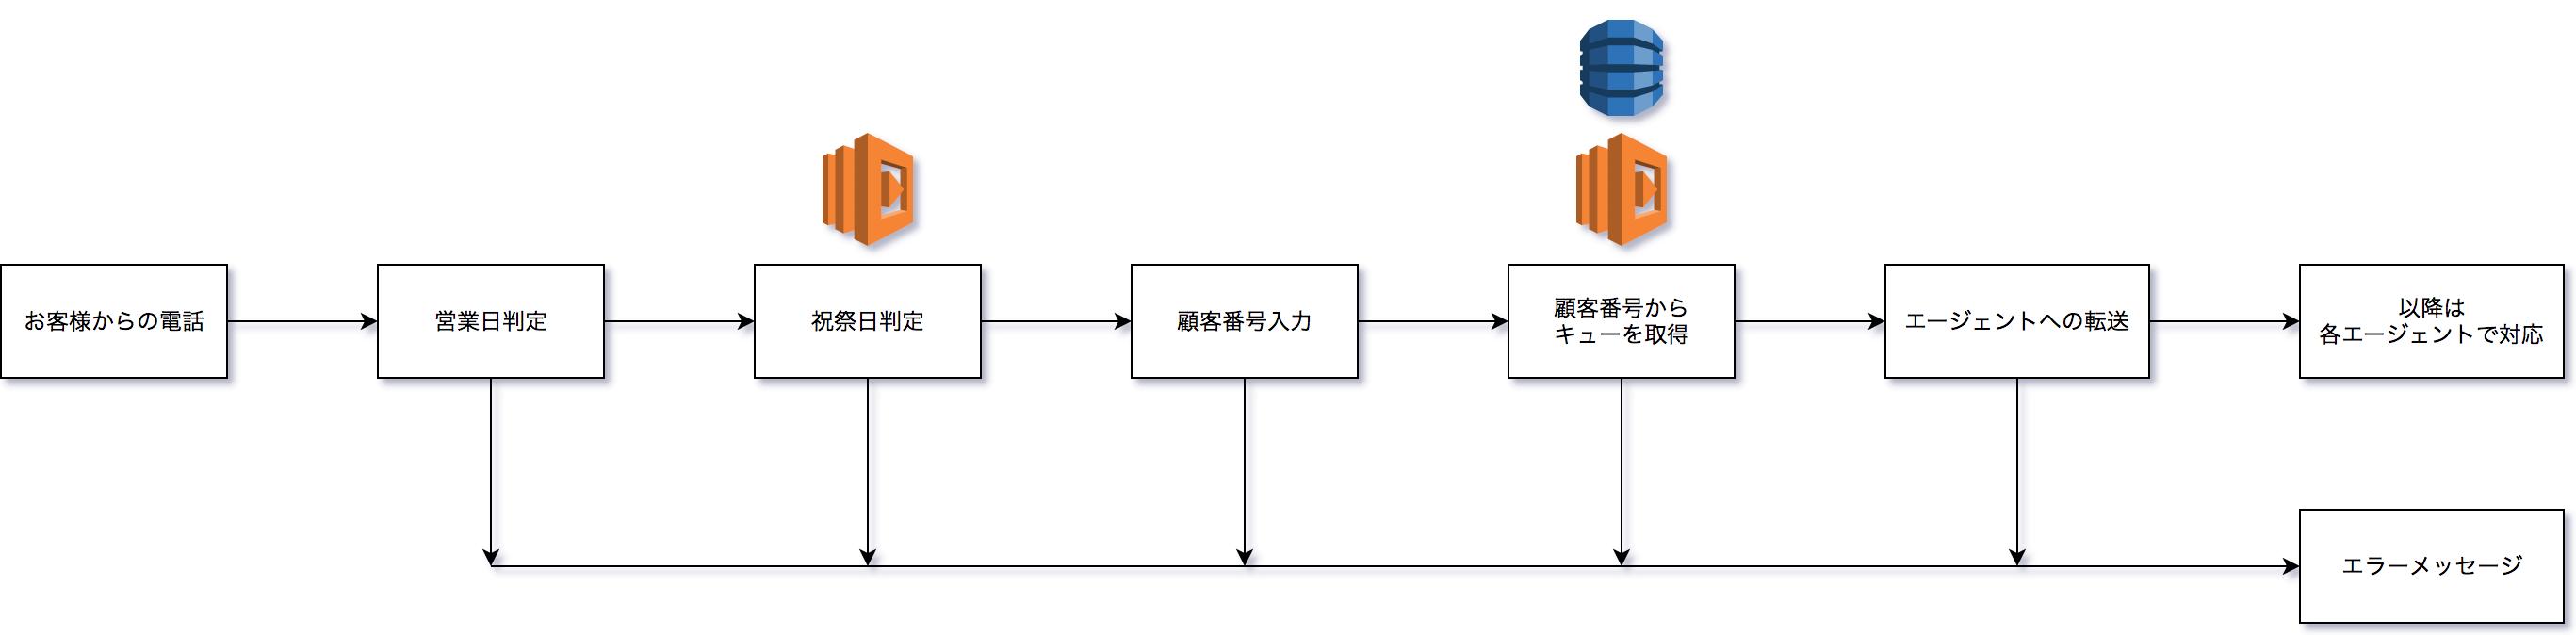 Amazon Connectで担当者直通電話システムの開発